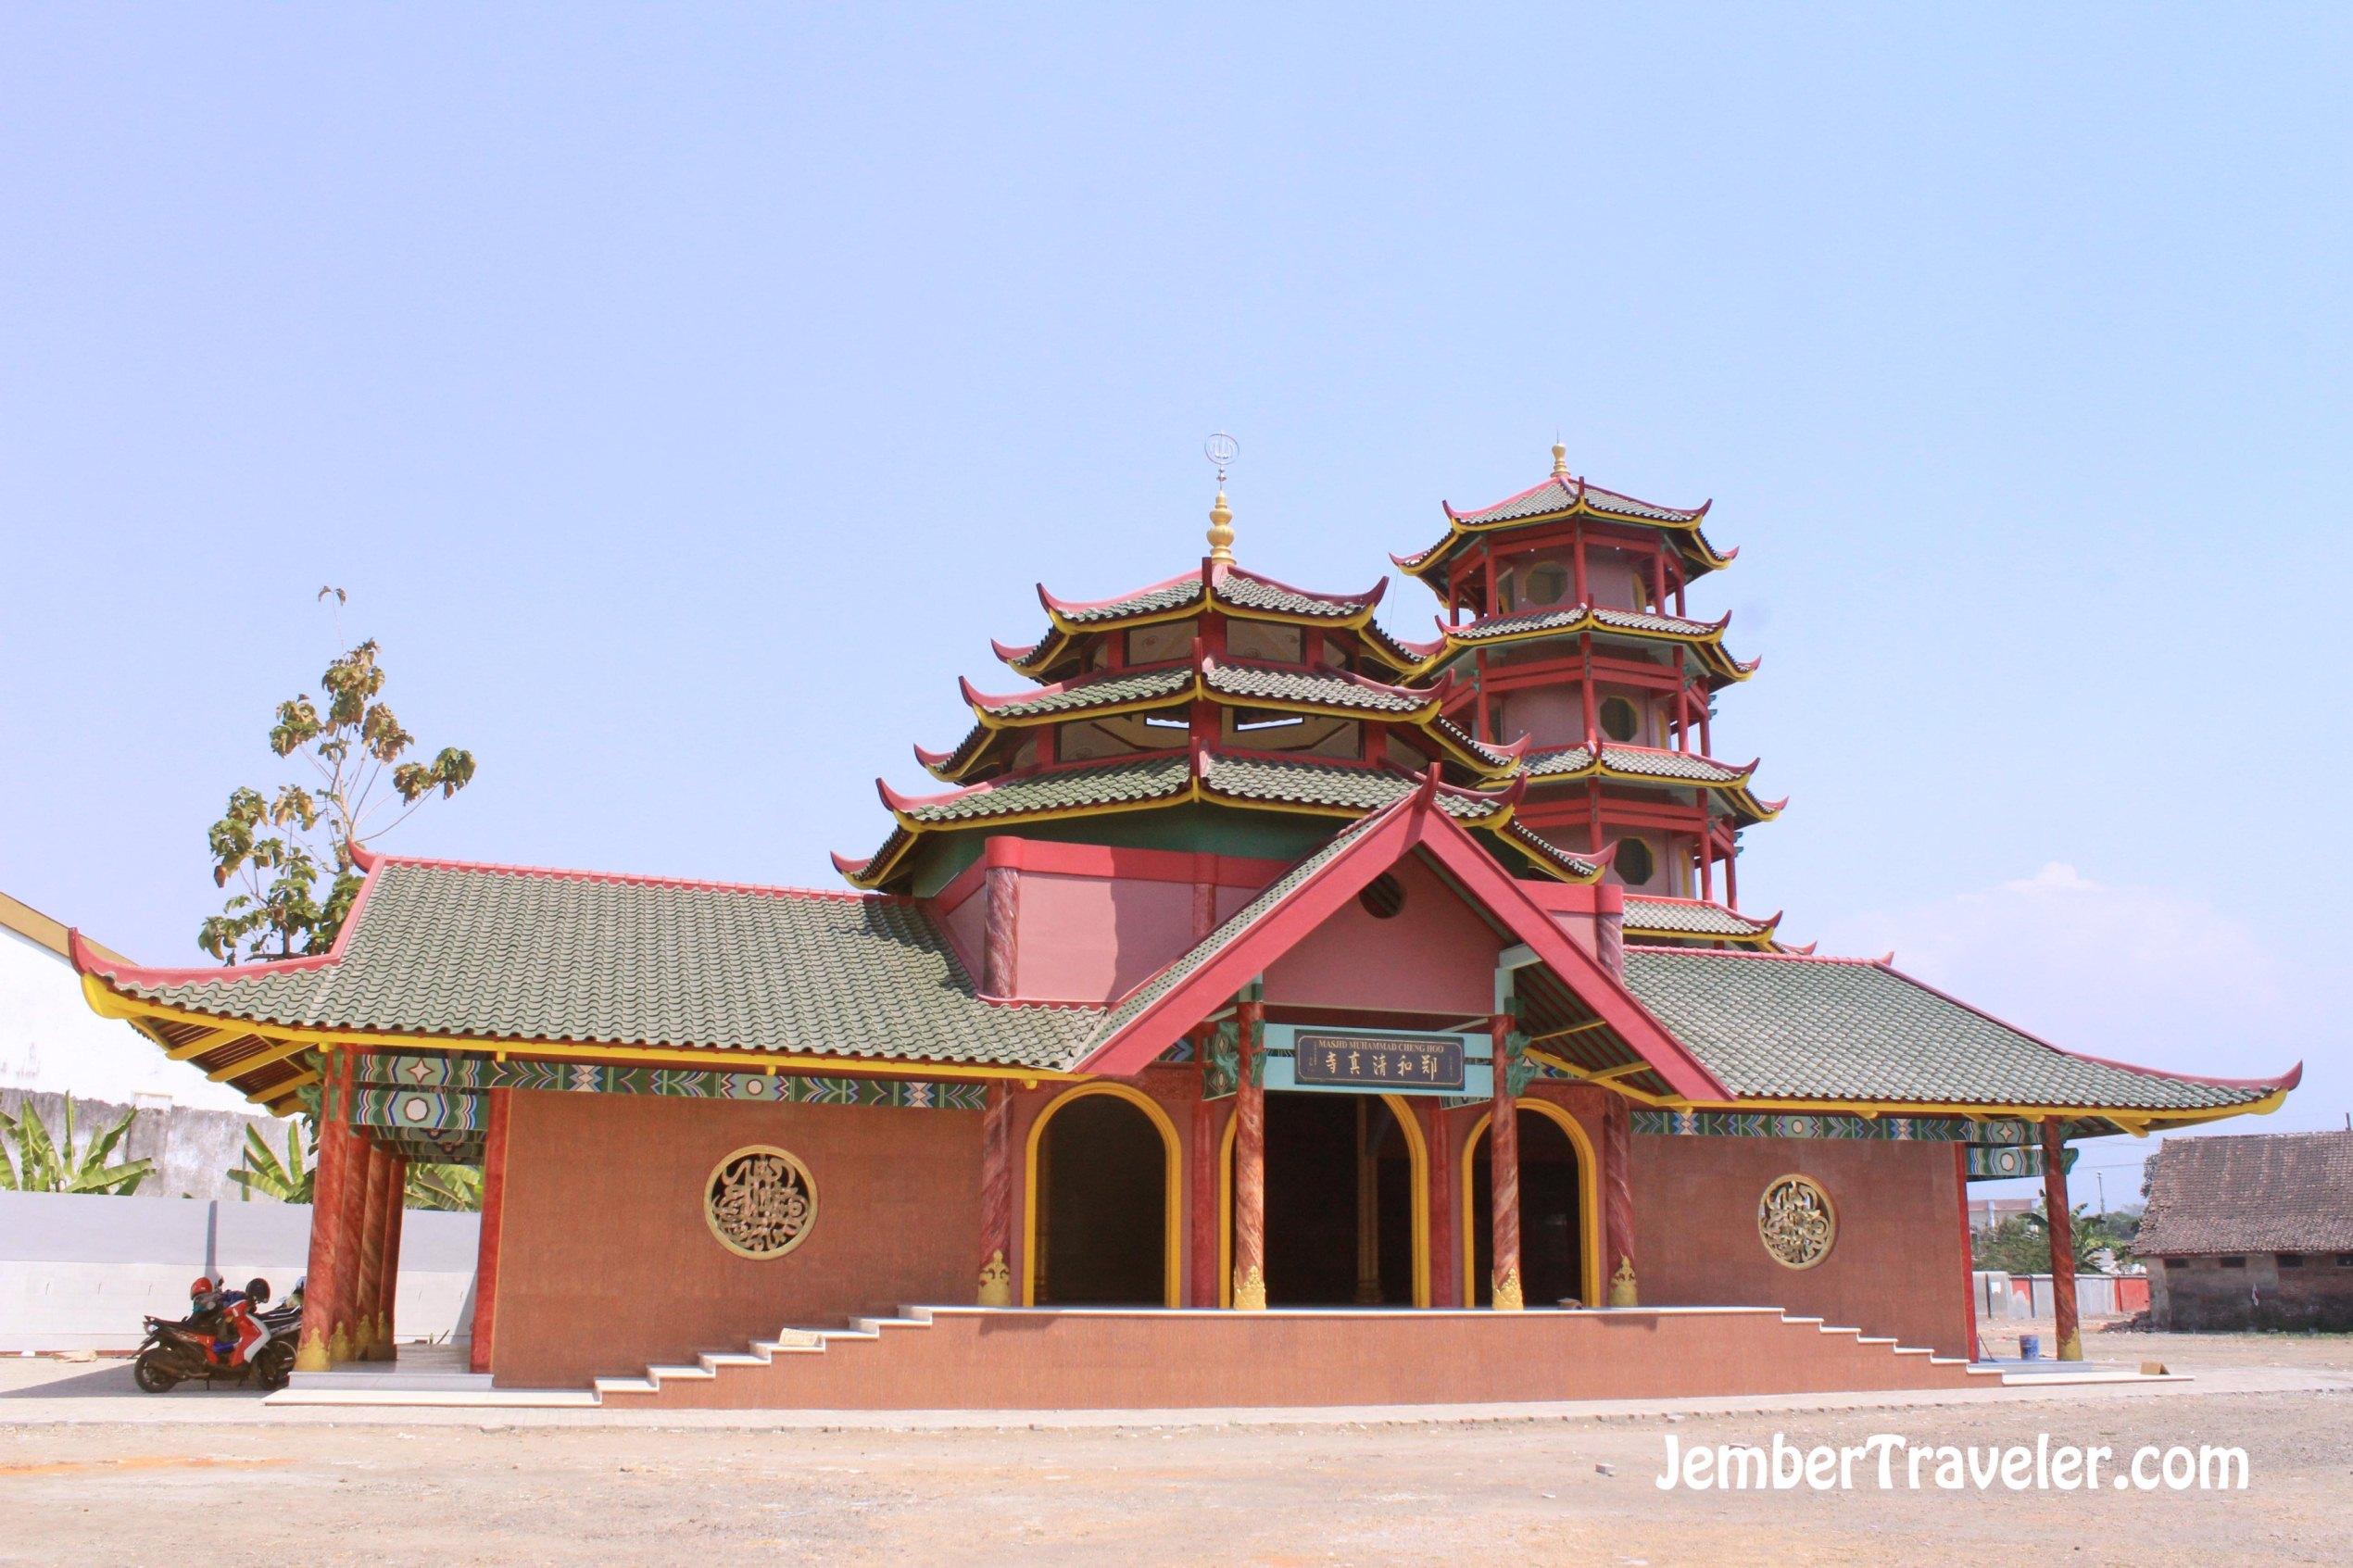 Masjid Muhammad Cheng Ho Jember Traveler Hoo Palembang Kota